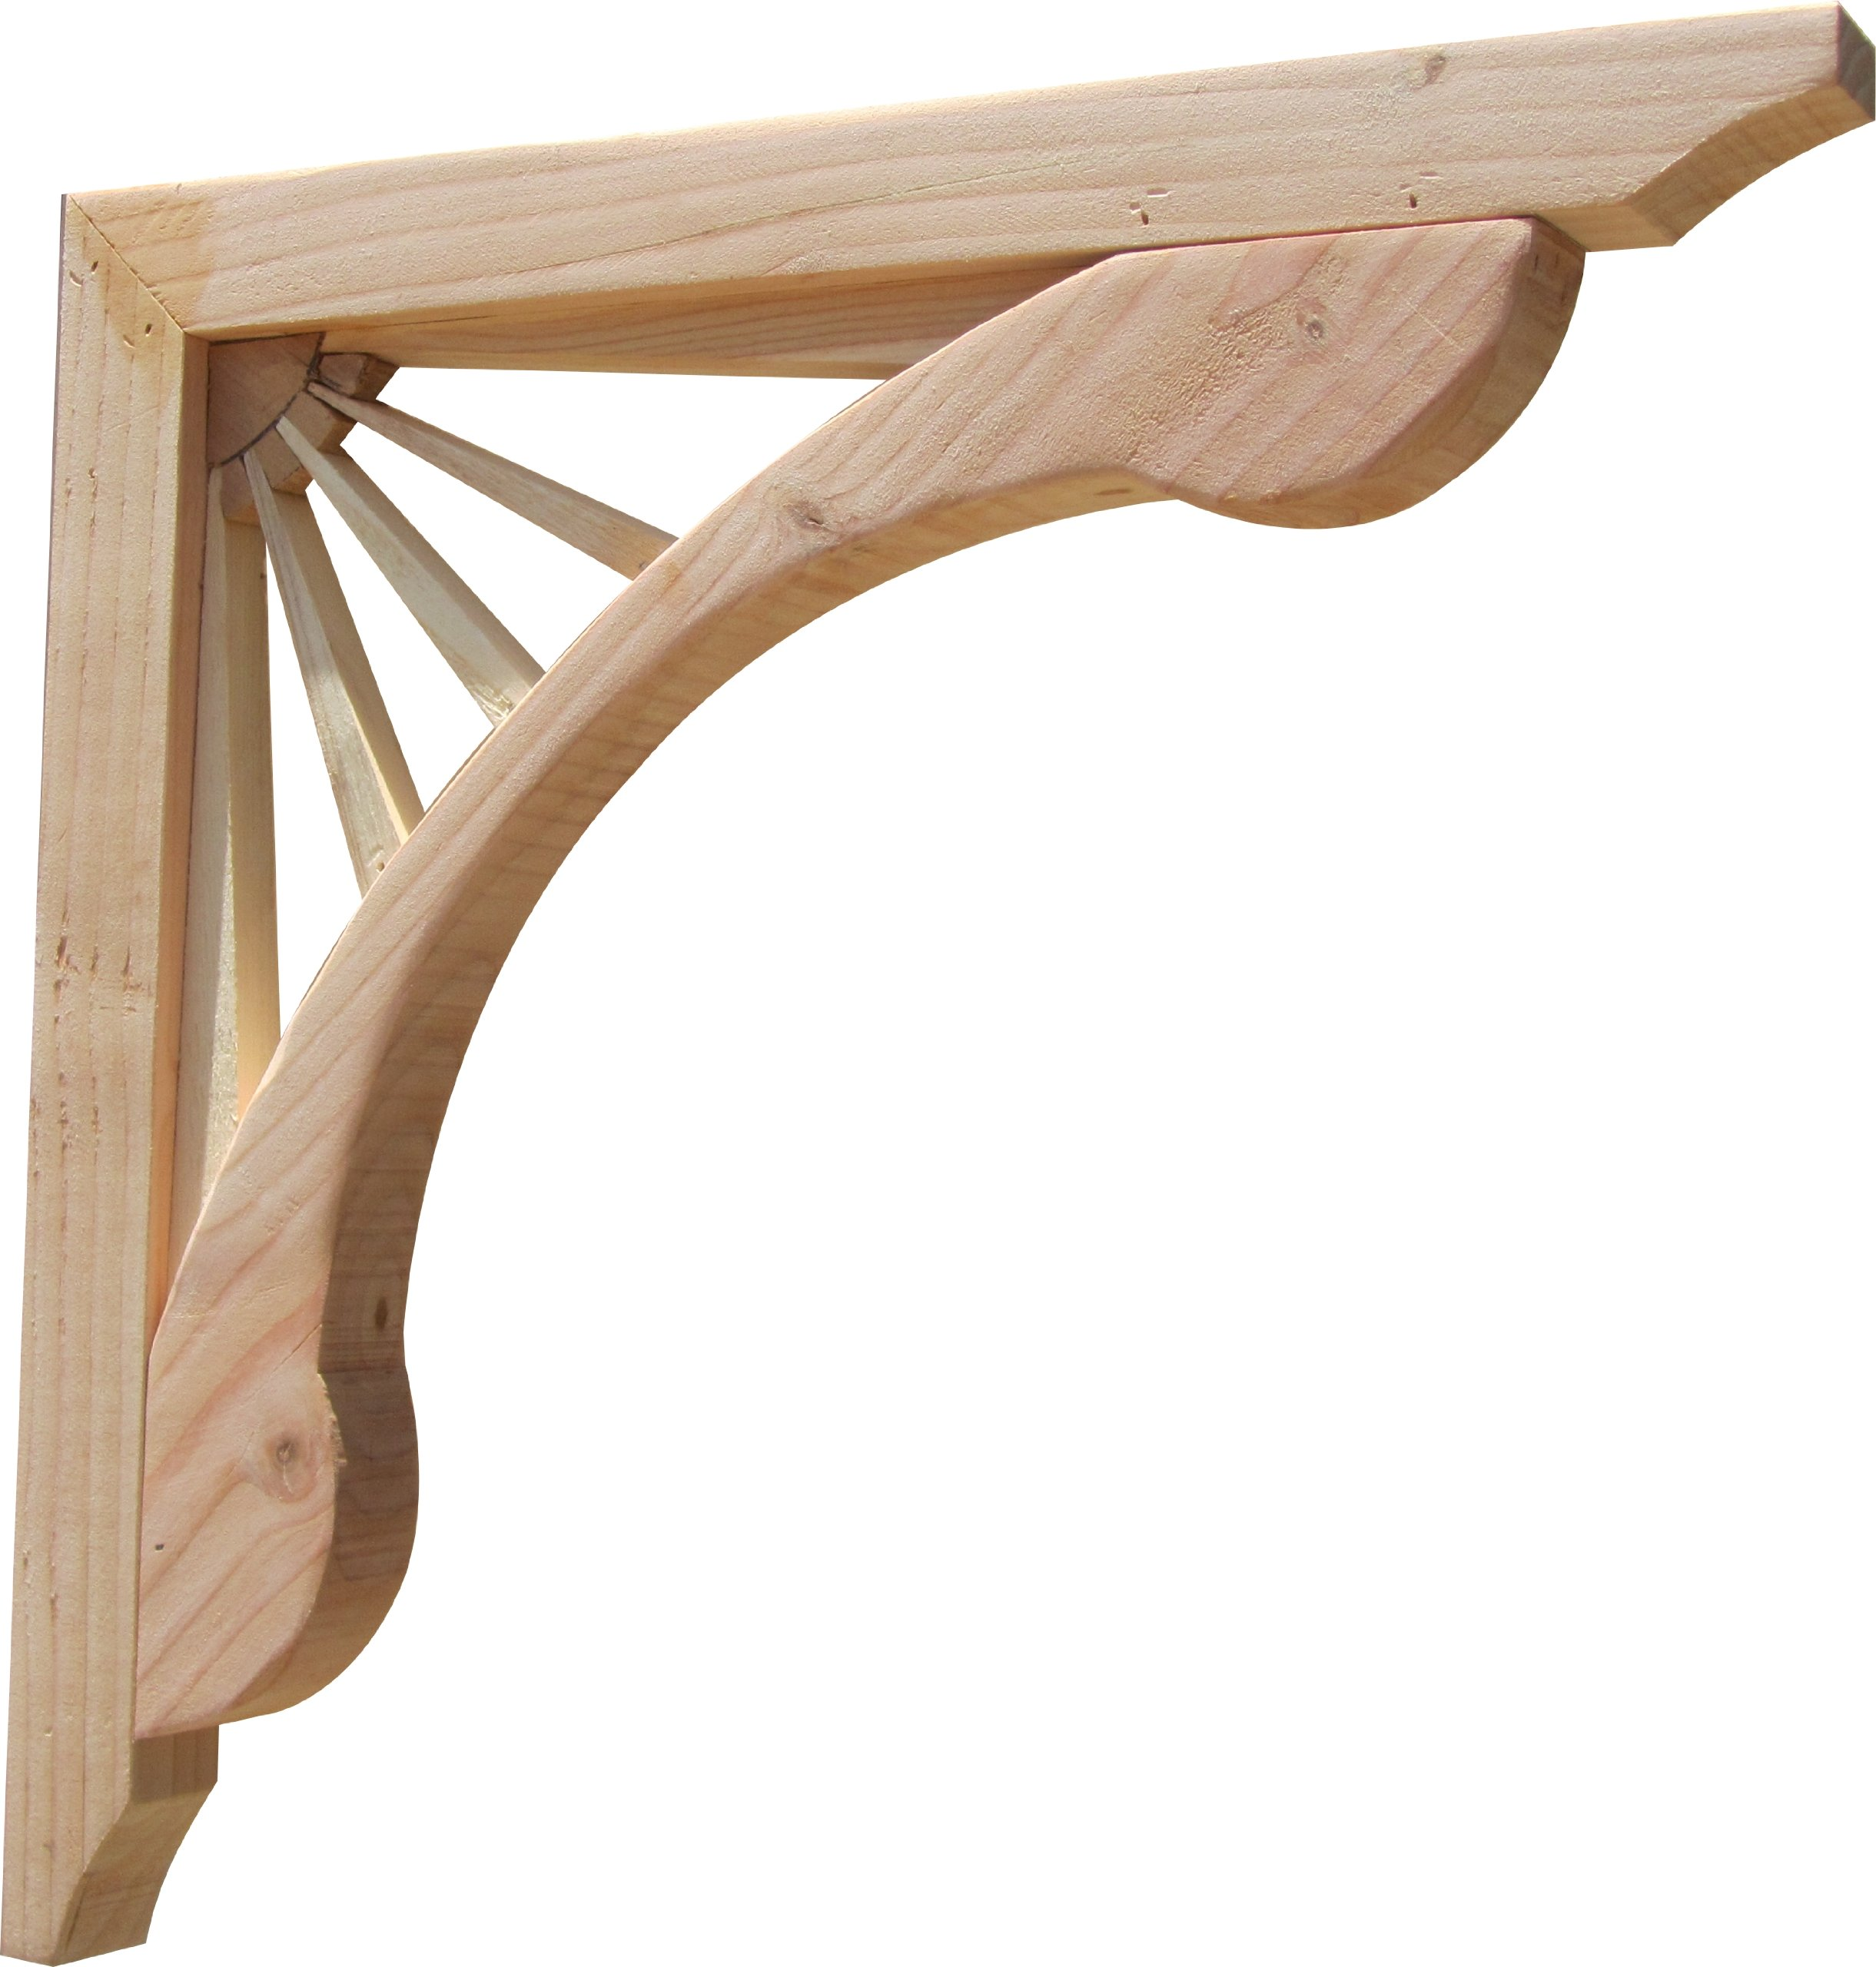 SamsGazebos Designer Wood Corbels, 2-pack, Sunburst, 16'' x 16'' x 1-5/8''